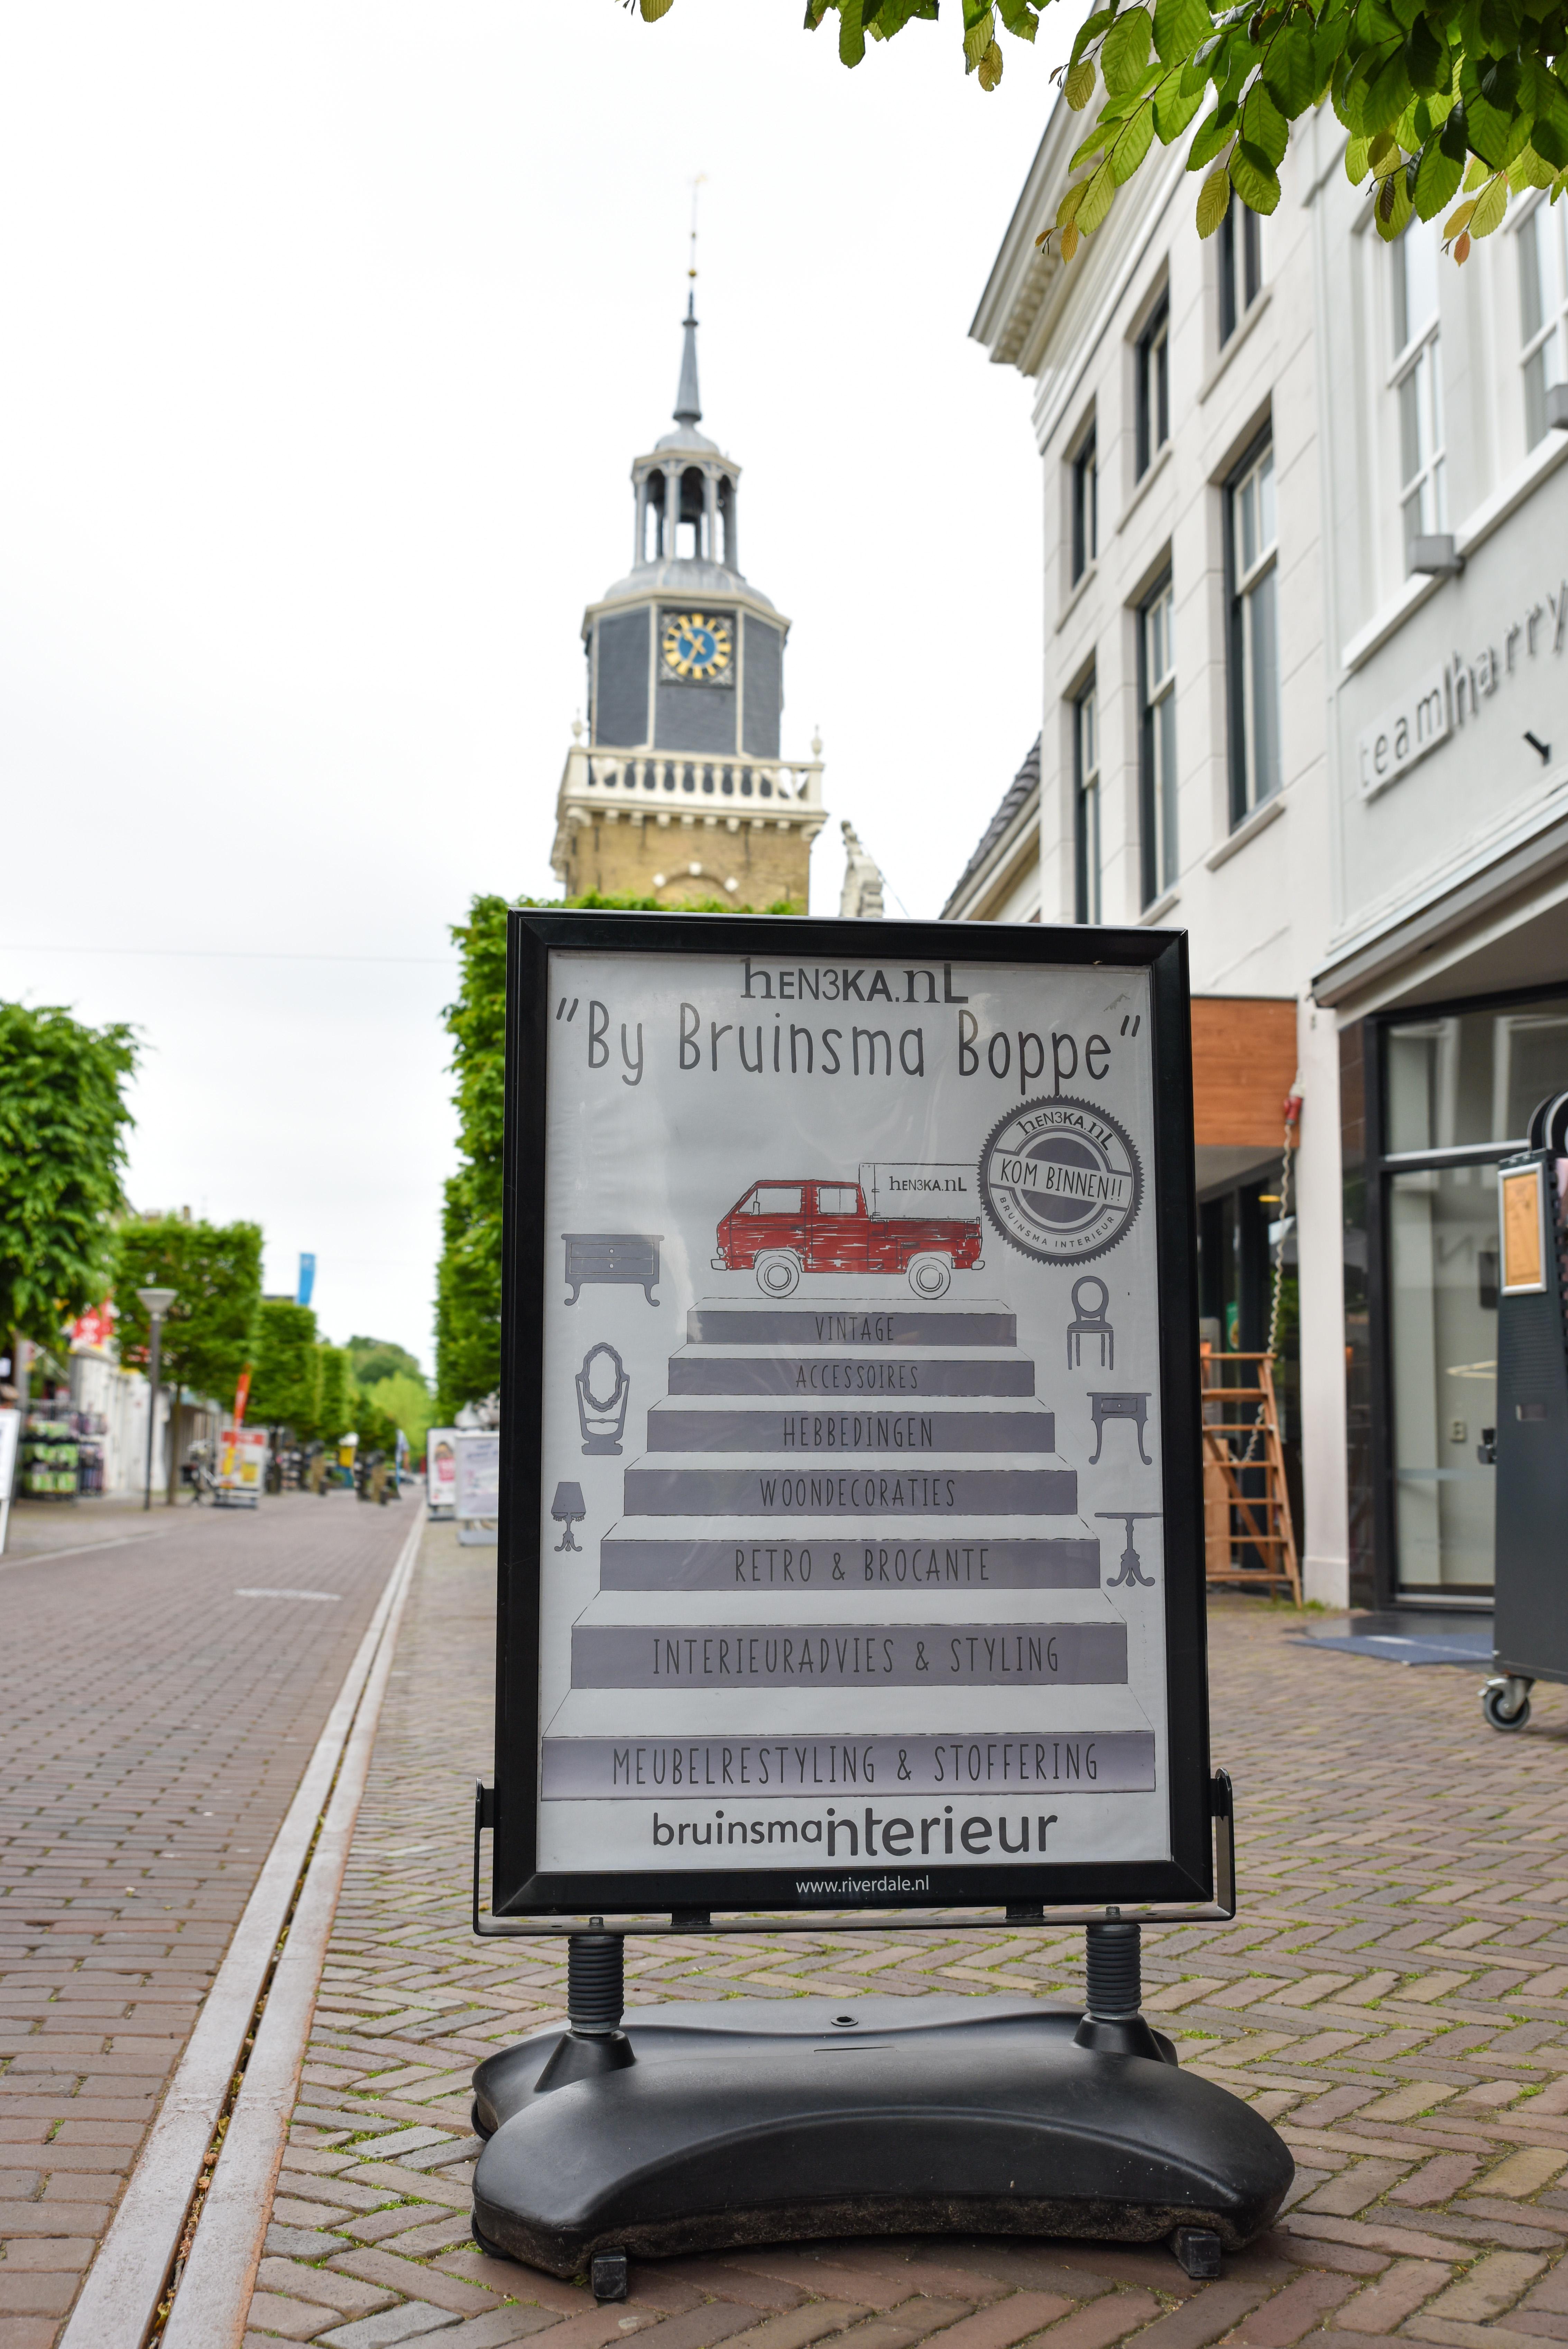 Hen3ka.nl